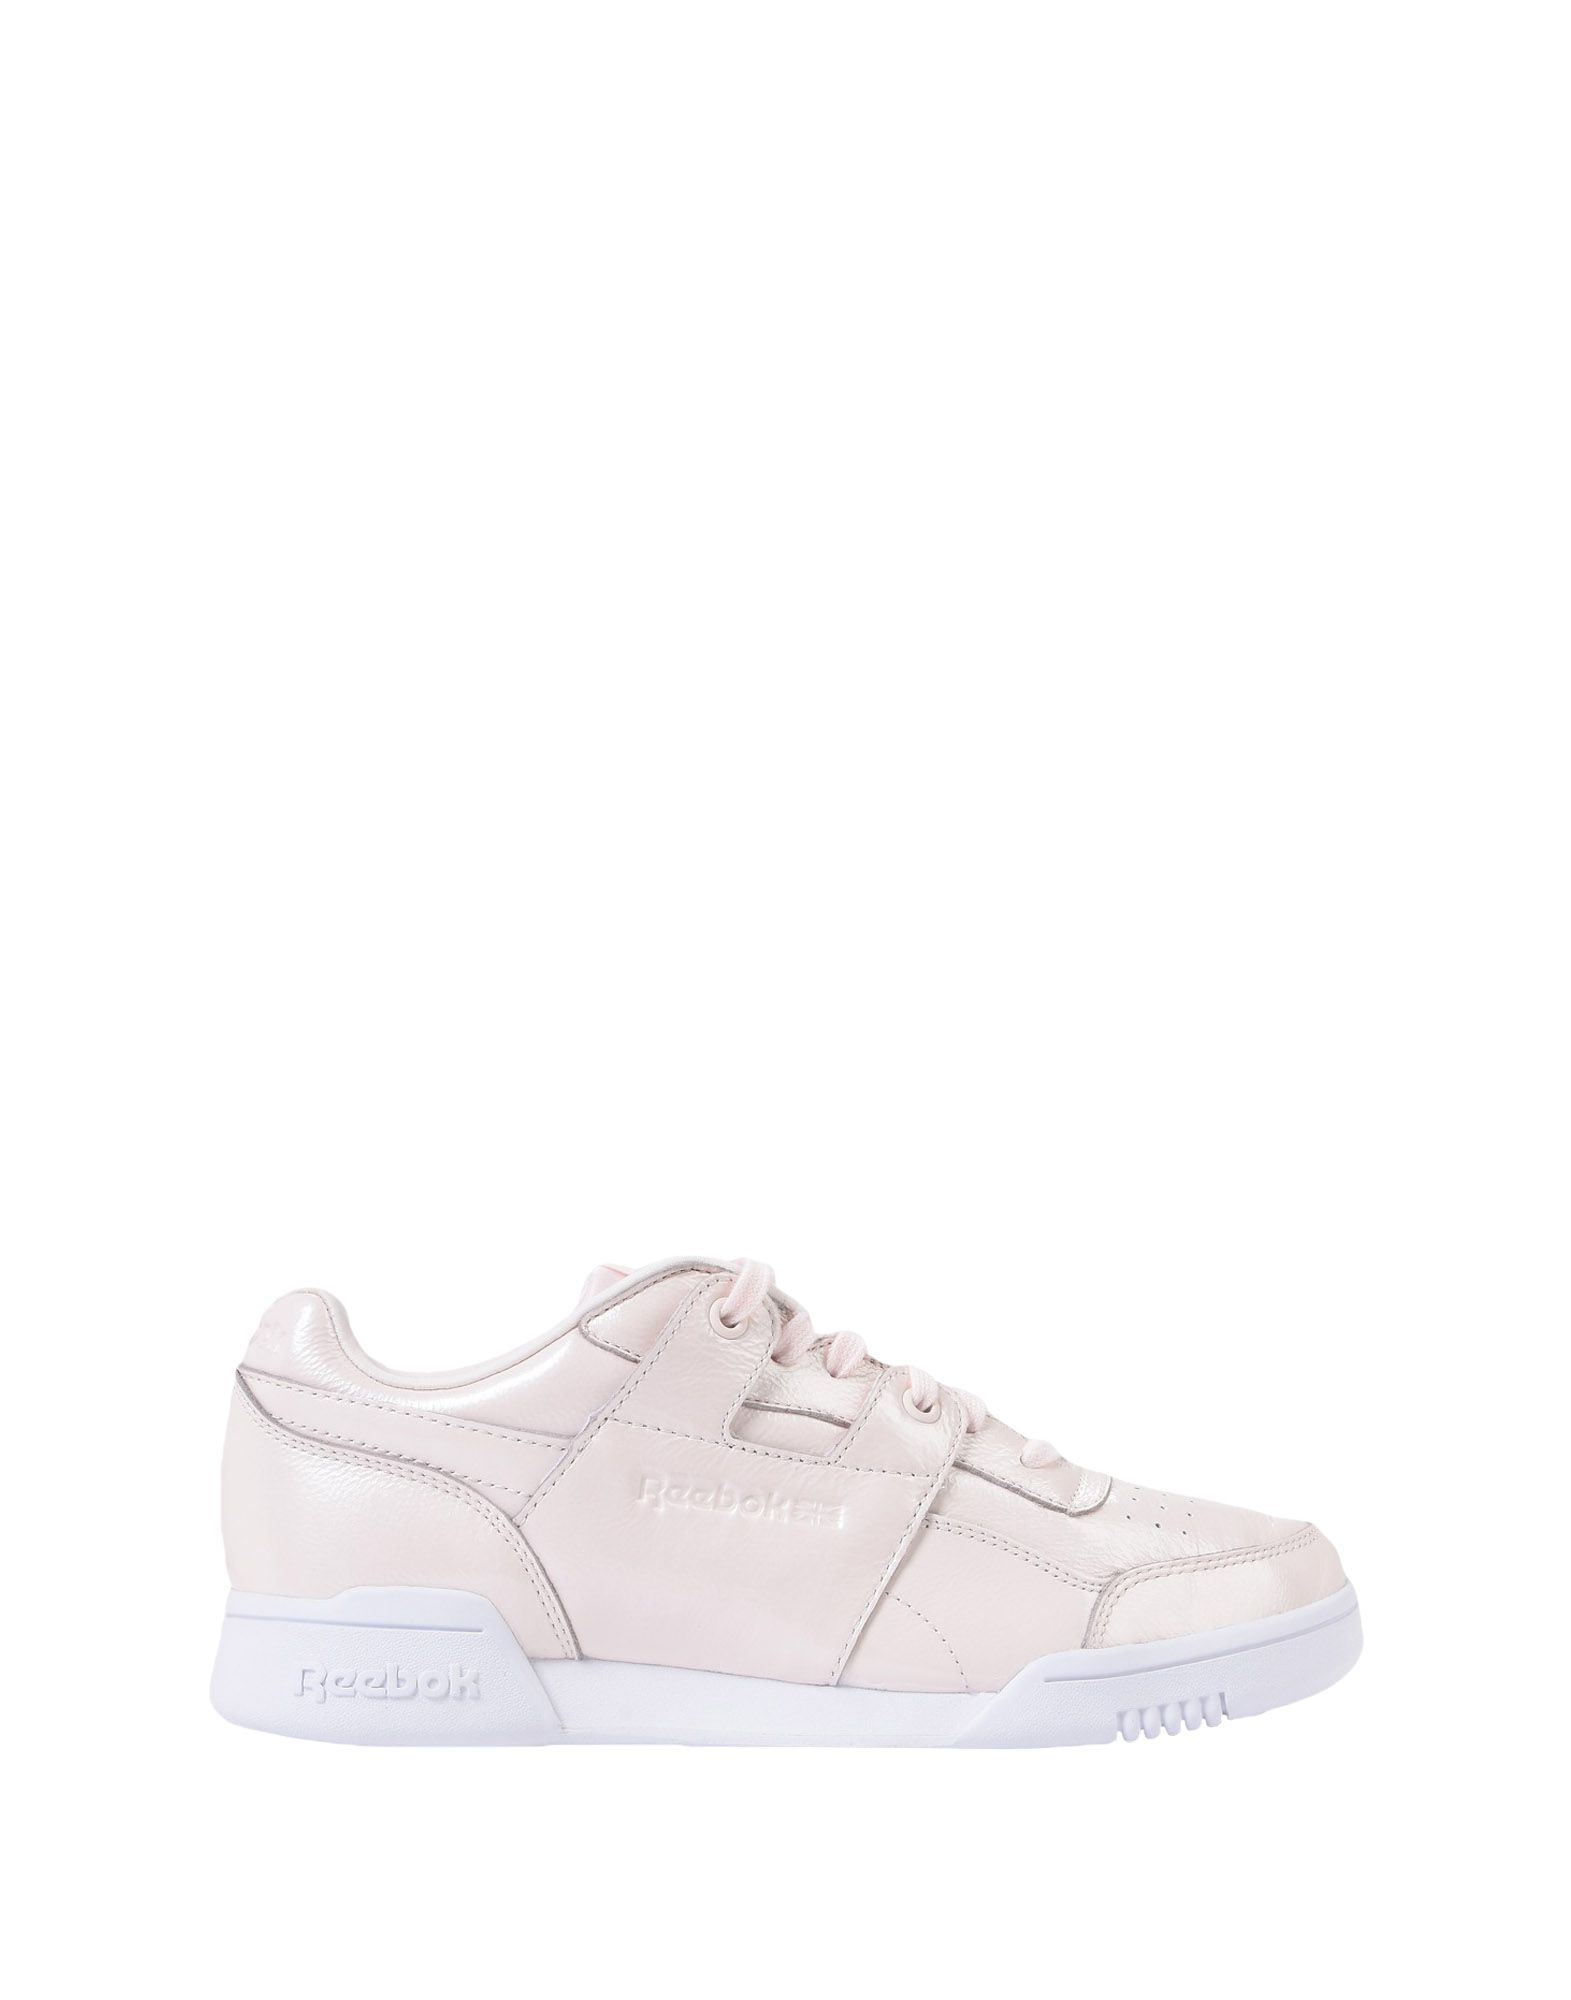 Reebok  W/O Lo Plus Iridesce  Reebok 11443609JN Gute Qualität beliebte Schuhe 6e6929